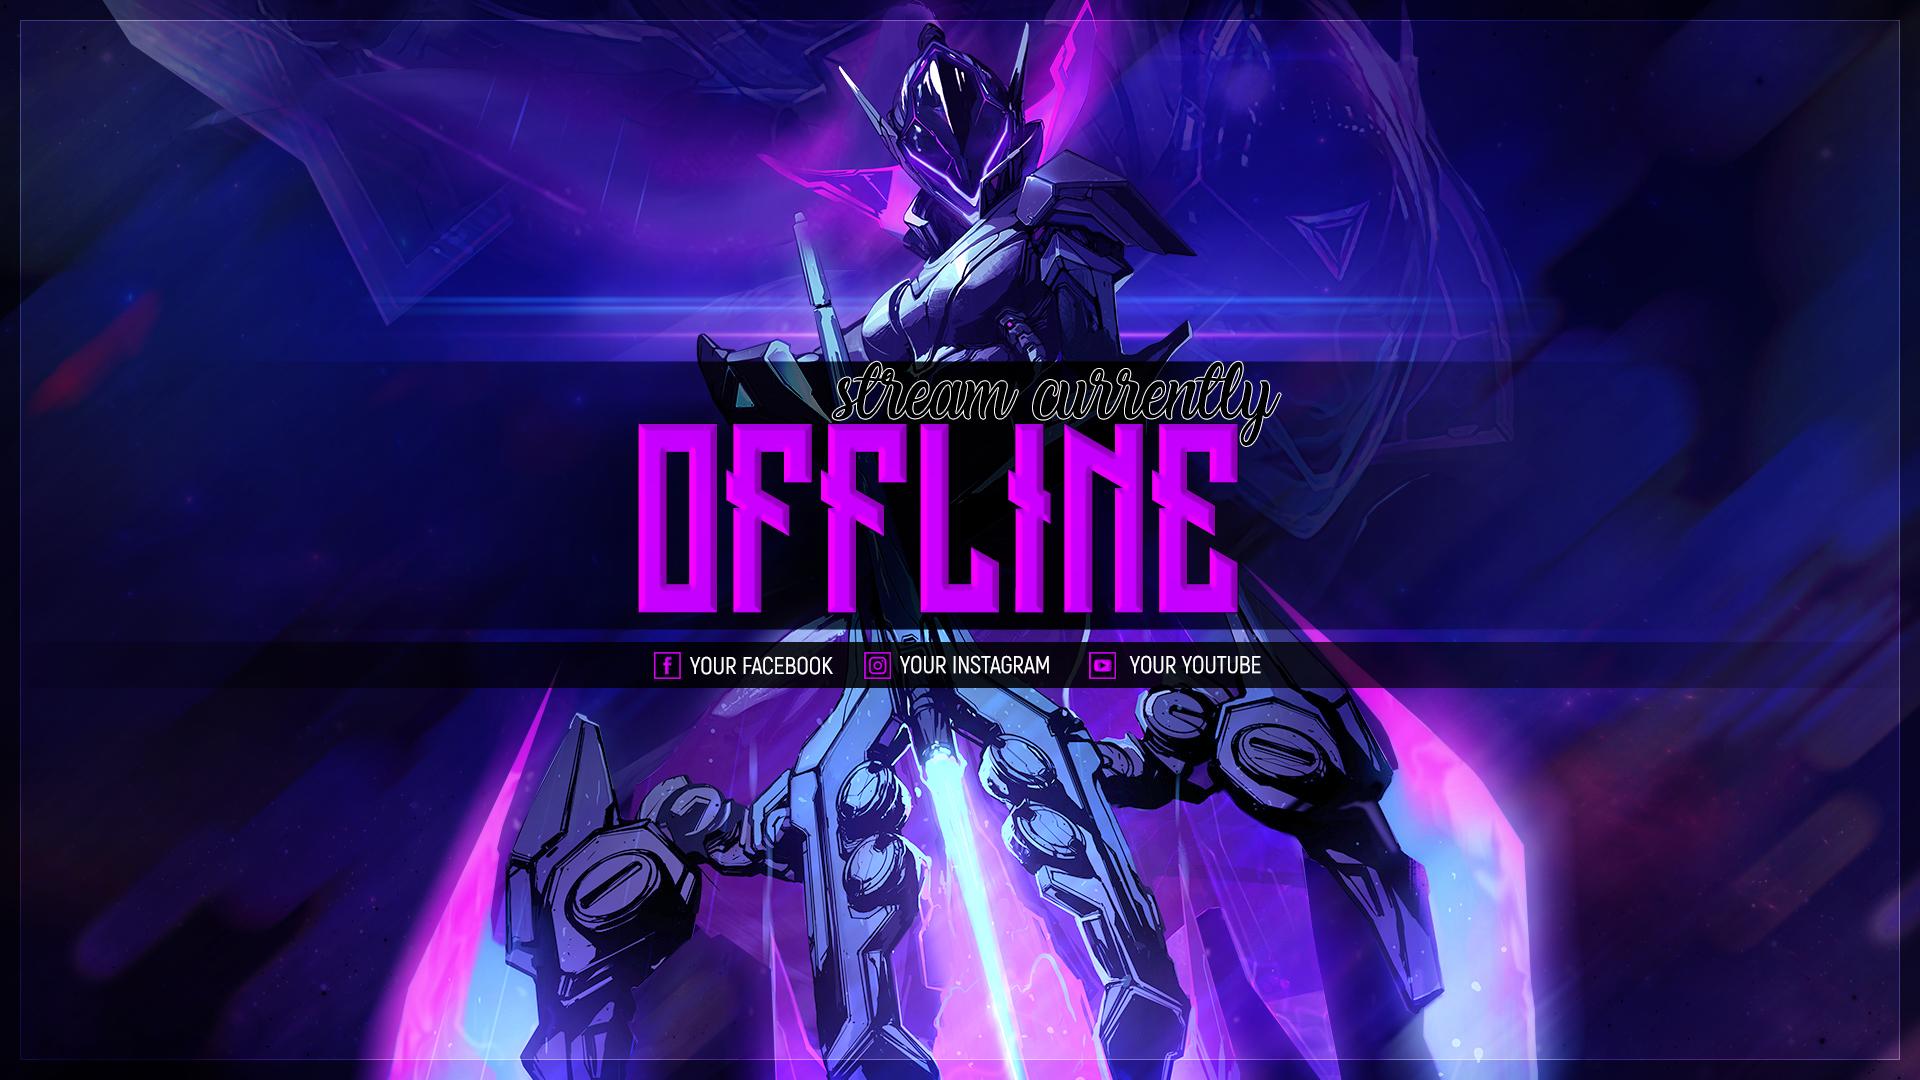 PROJECT Vayne Offline screen by Psychomilla